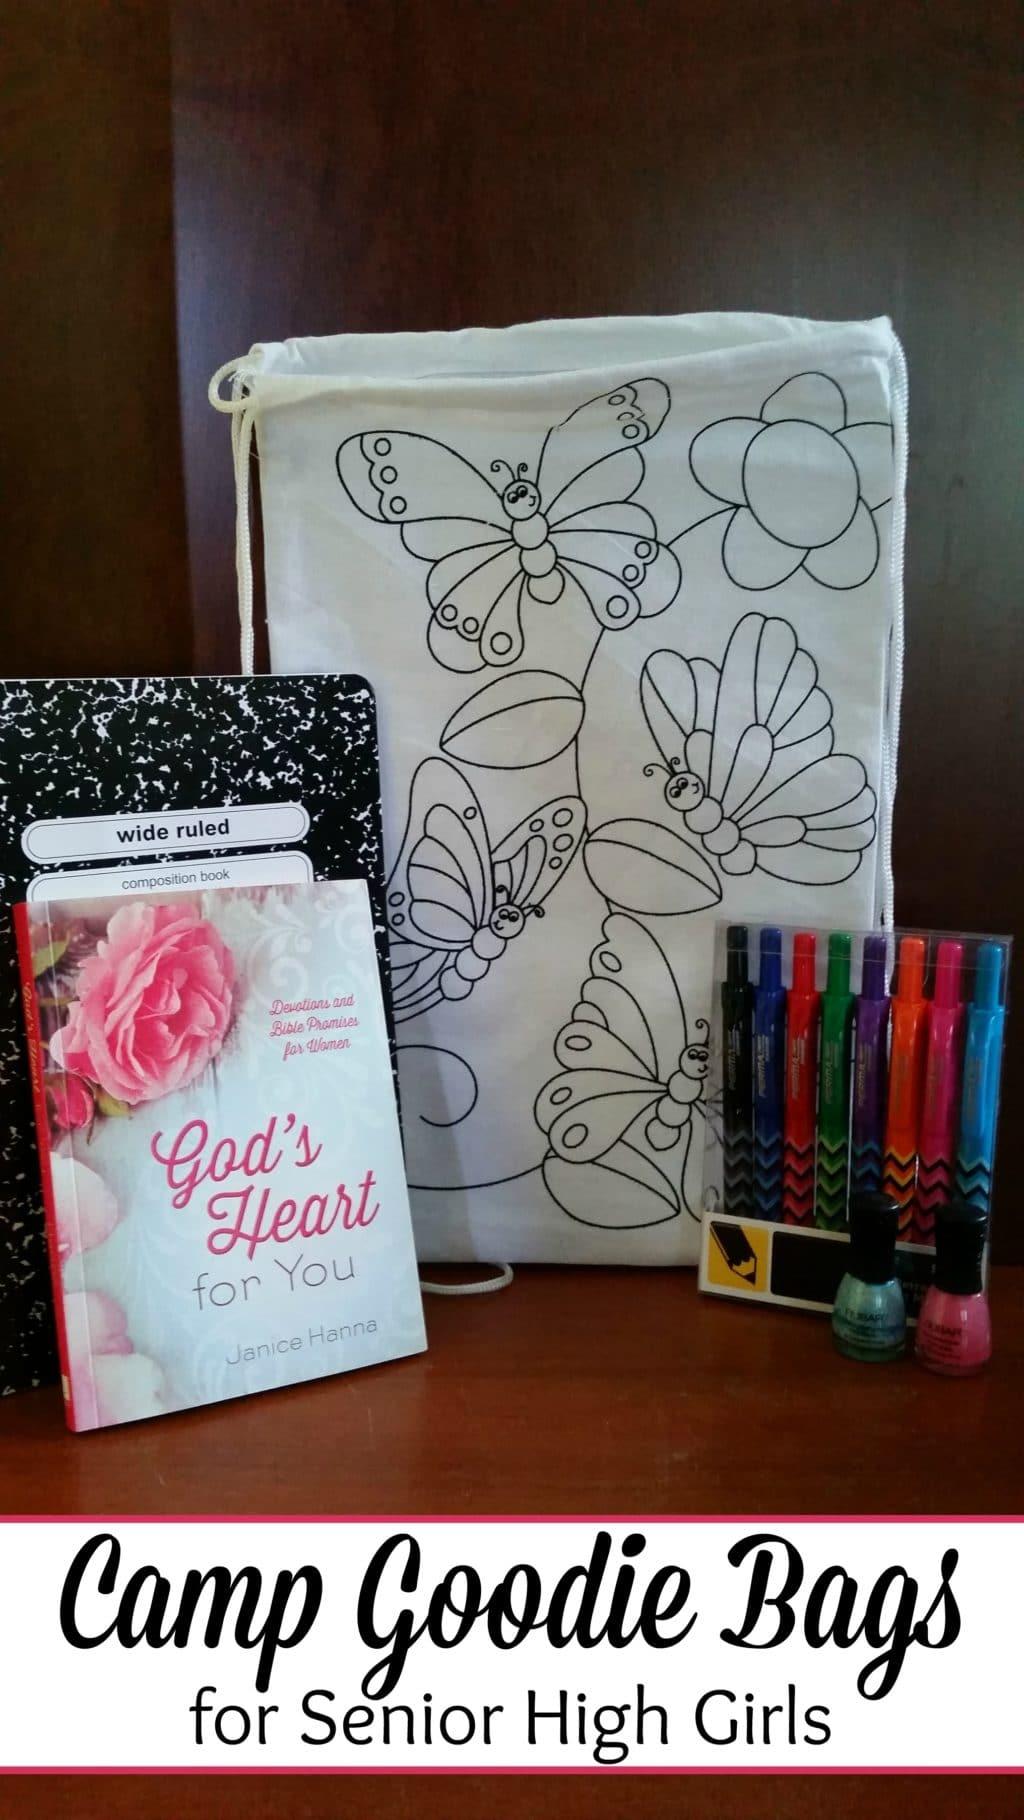 camp goodie bags for senior high girls @thatbaldchick